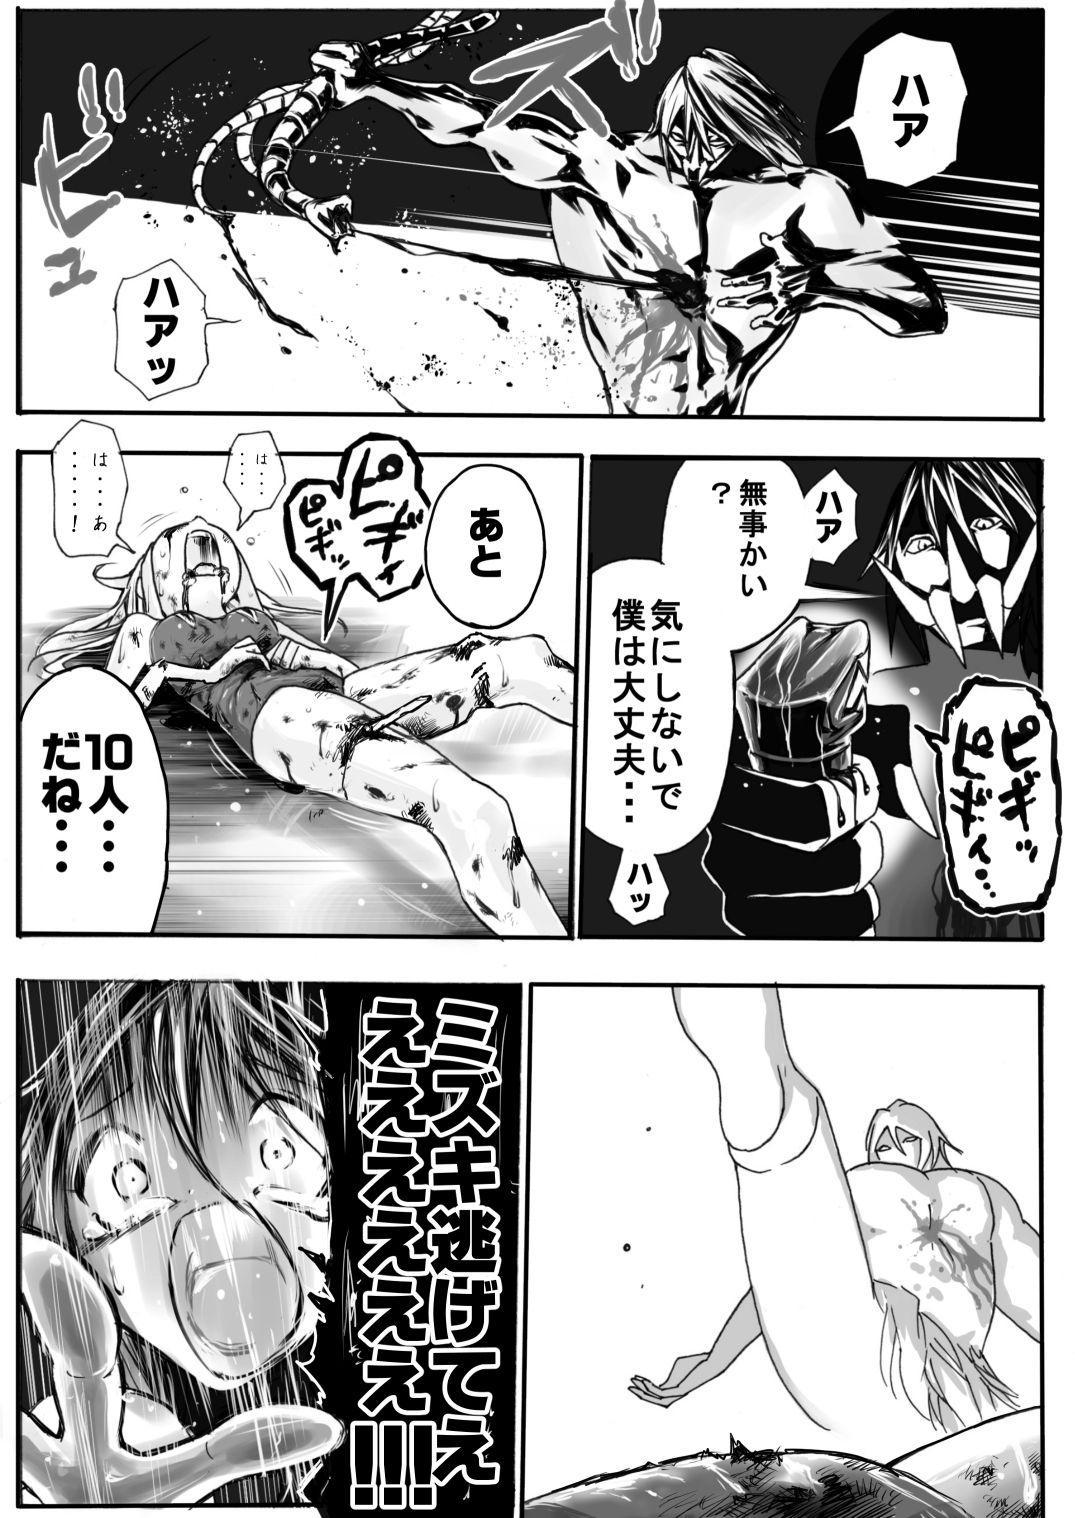 Sukumizu Senshi Ryona Manga 2-kan 92